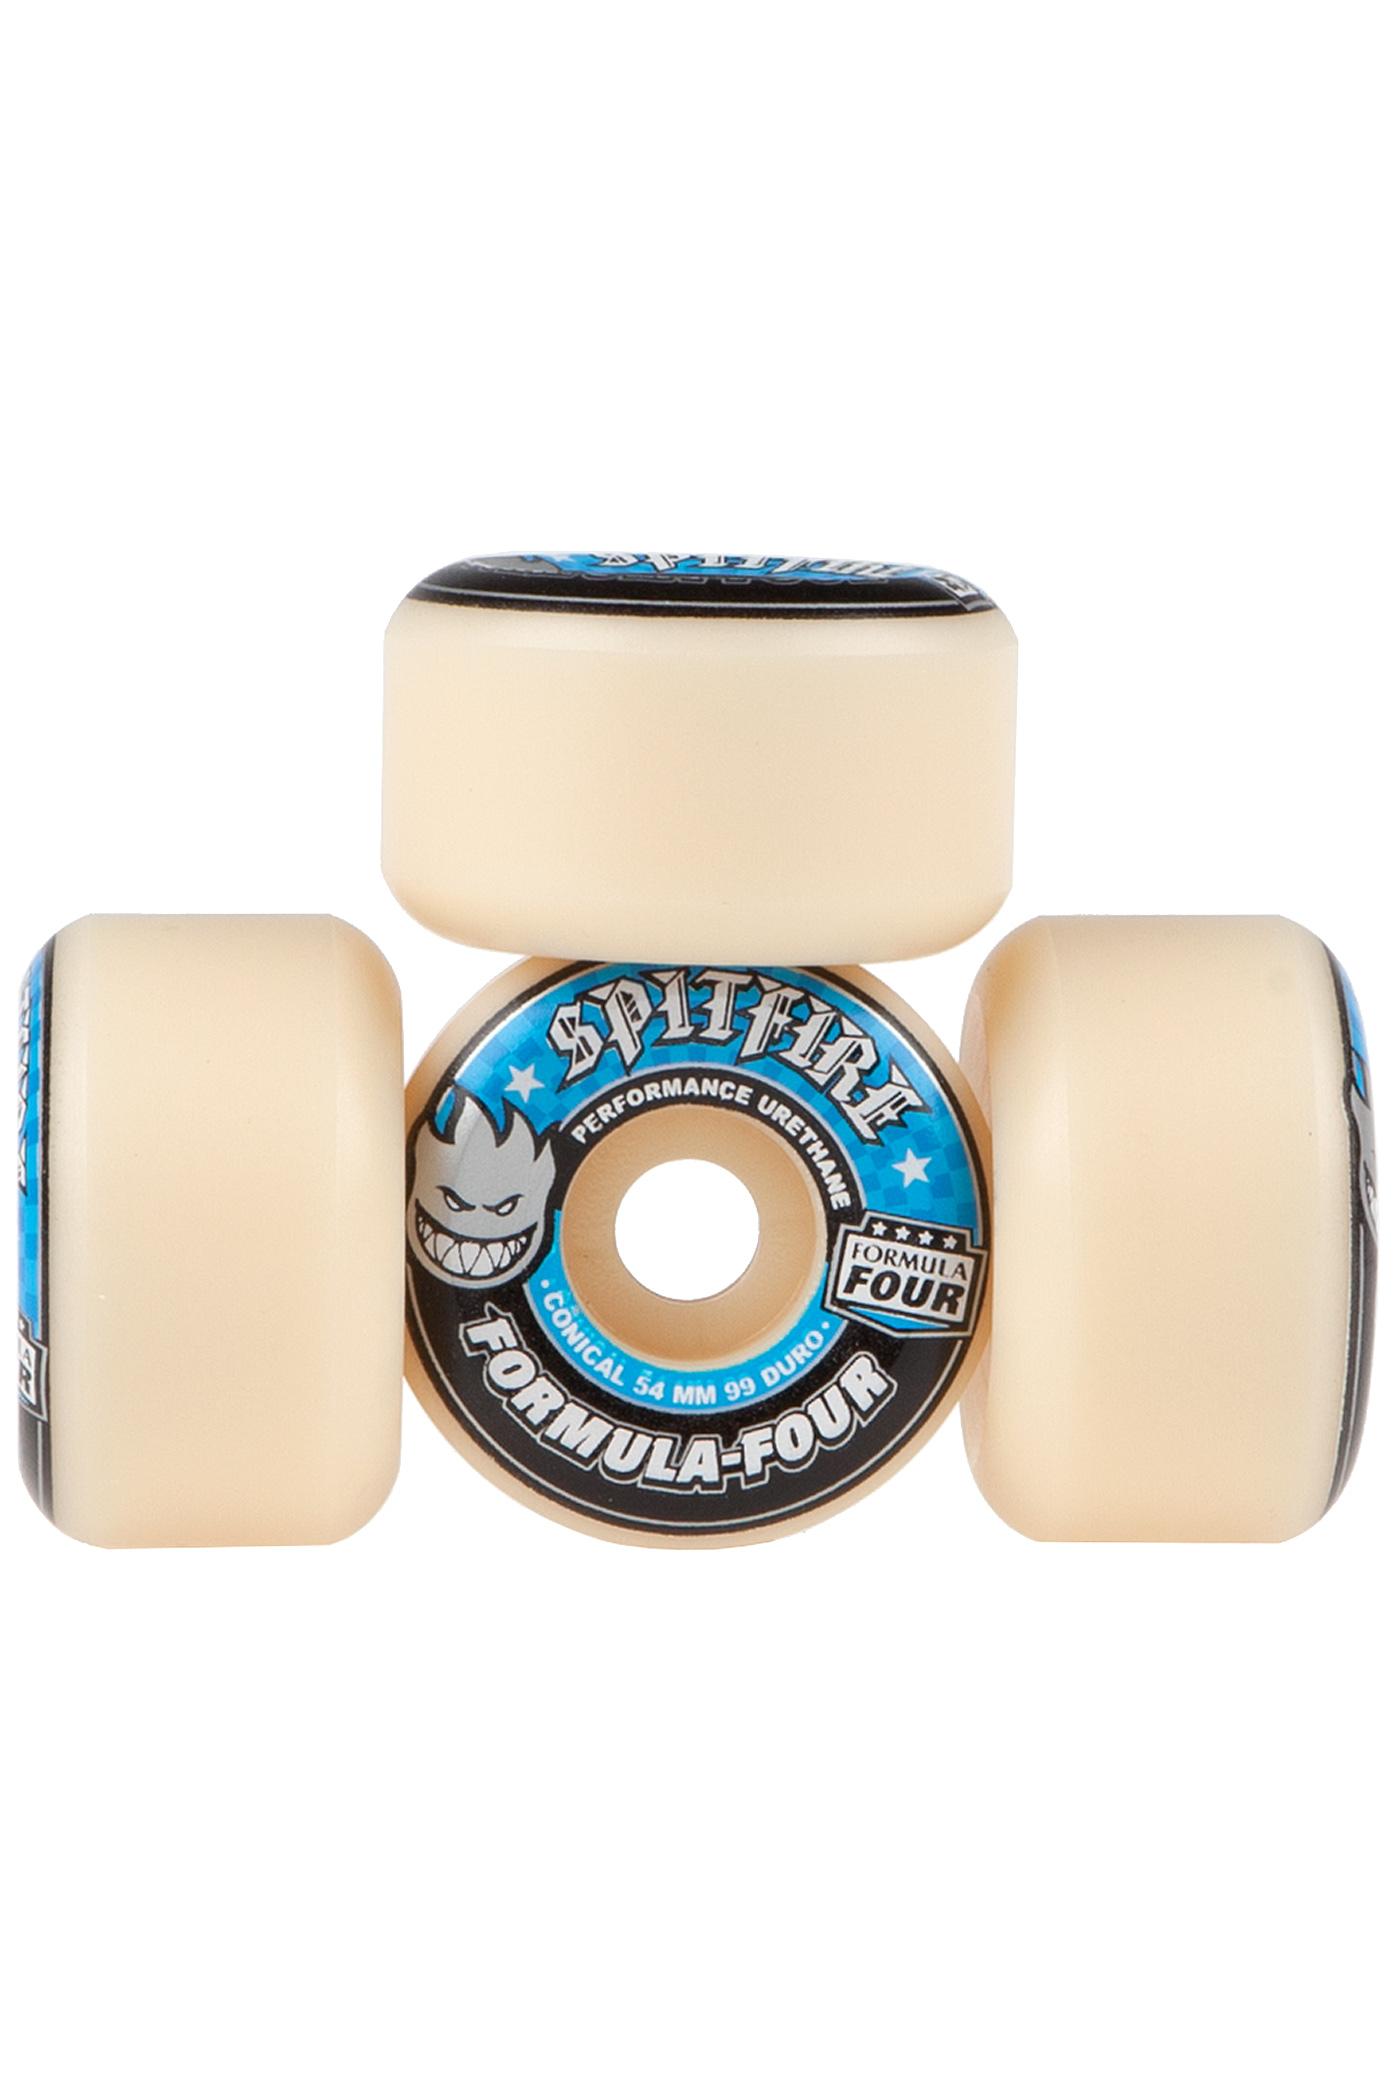 Spitfire Formula Four Conical Skateboard Wheels - Free ...